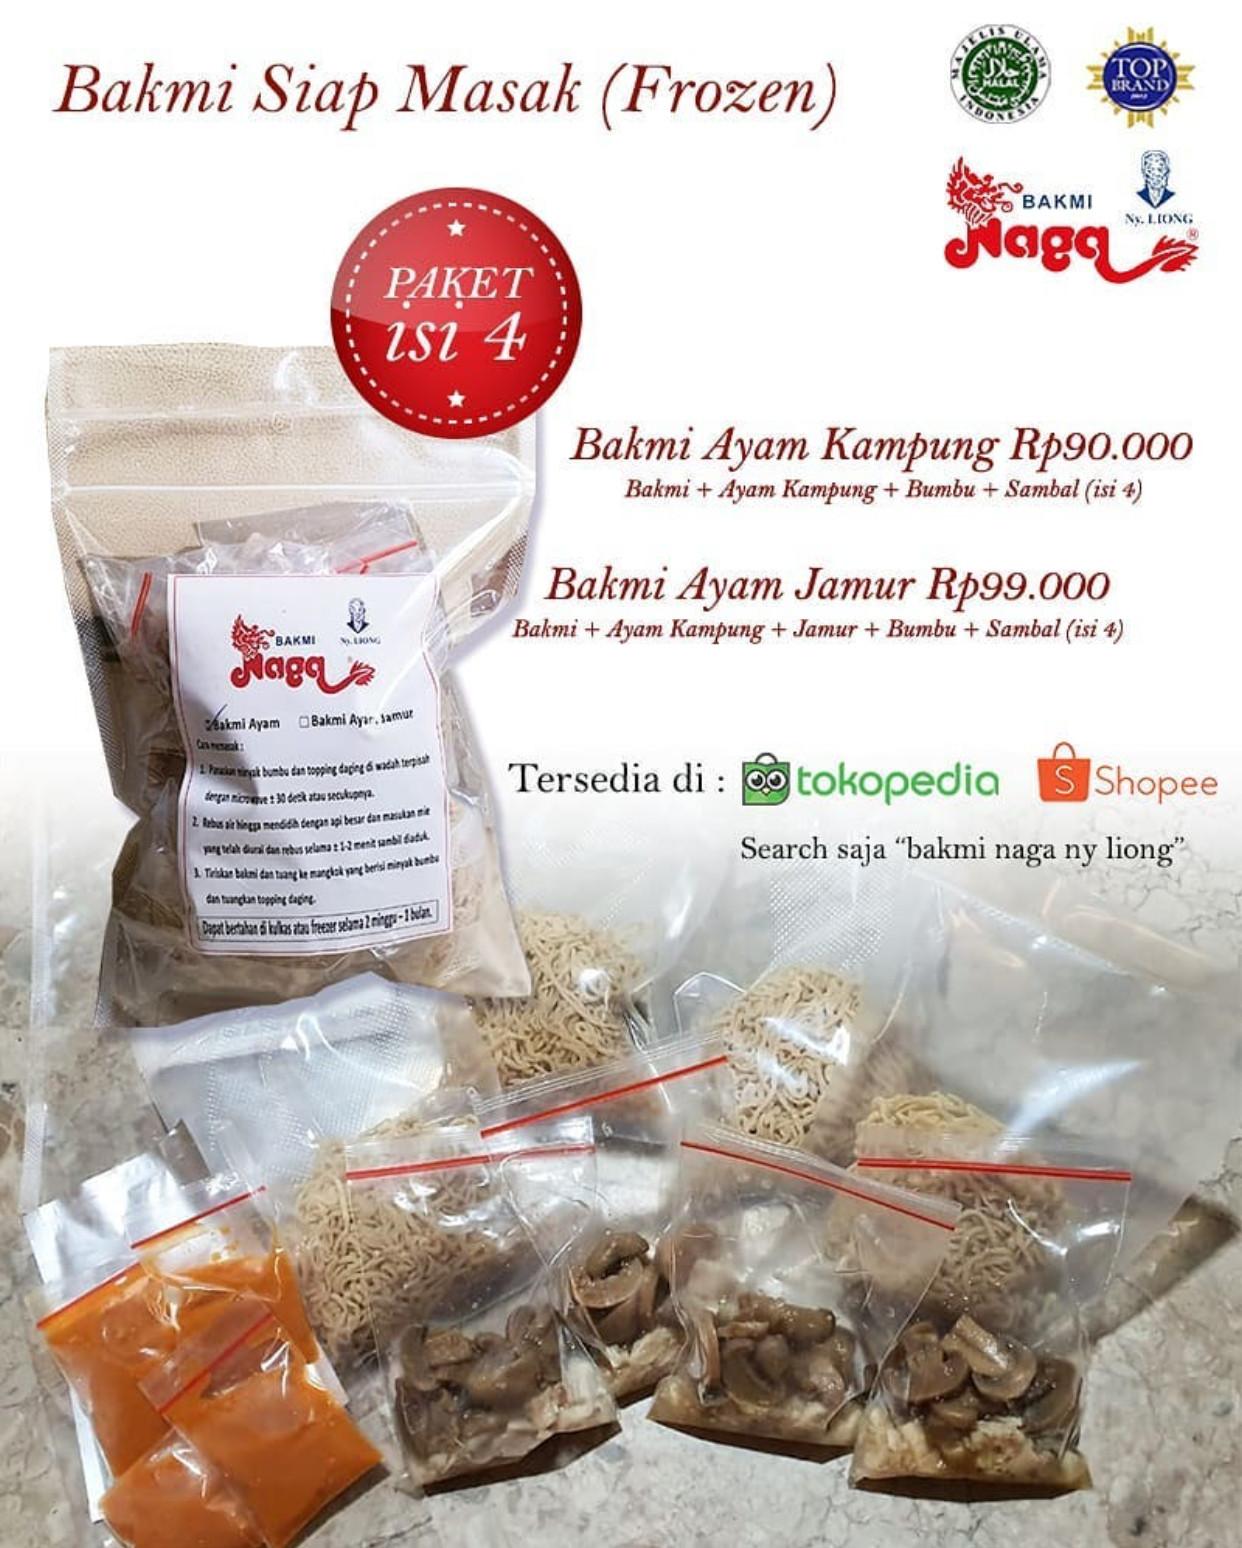 Promo Bakmi Naga Terbaru Paket Isi 4 Porsi Harga Spesial Hanya Rp 90.000!